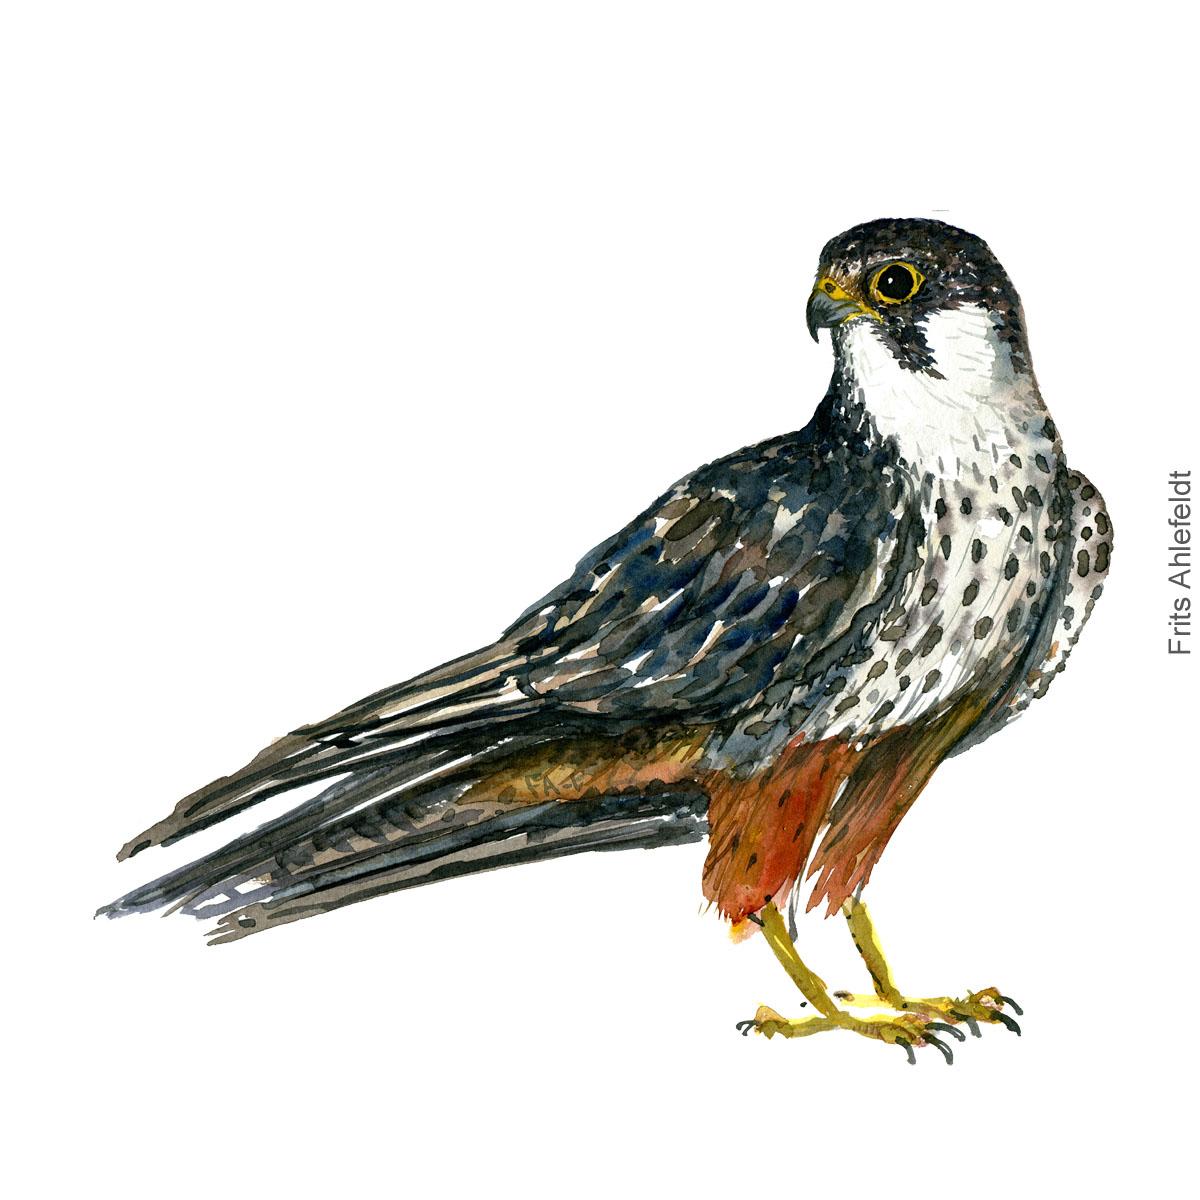 Laerkefalk - Hobby - Bird painting in watercolor by Frits Ahlefeldt - Fugle akvarel